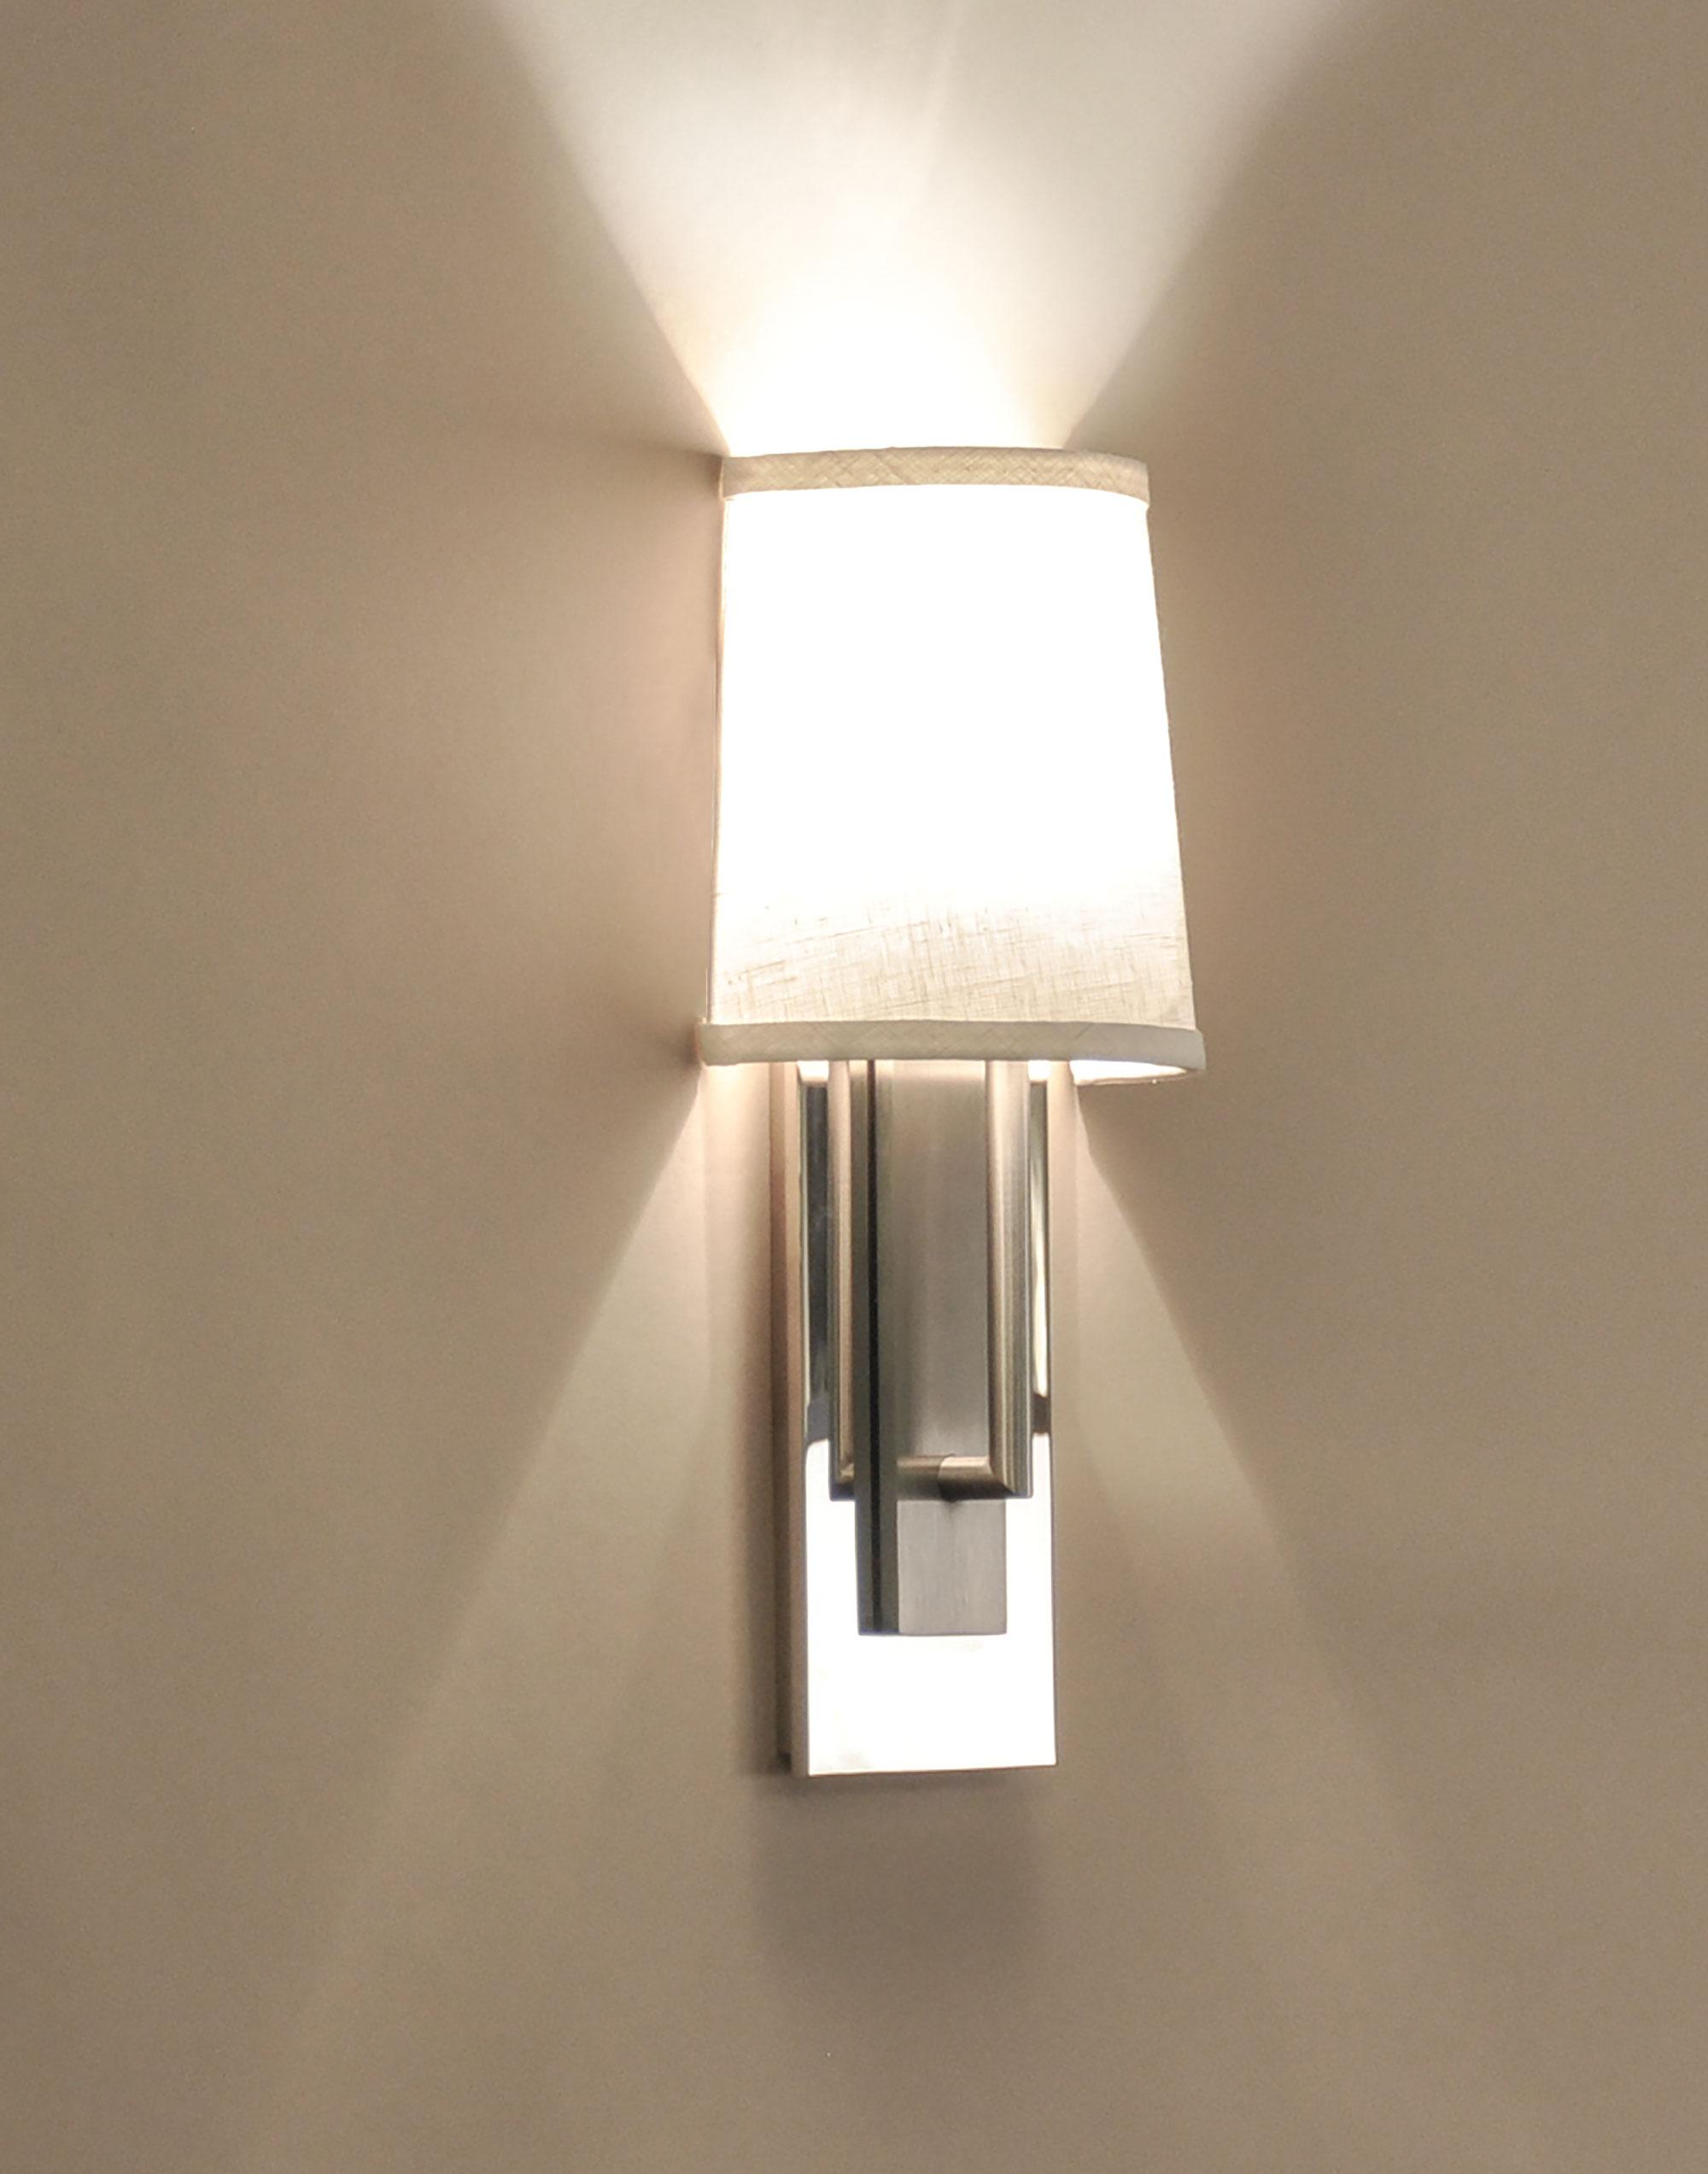 Wall lamp Belmont ada wall lamp ZCBHBBQ